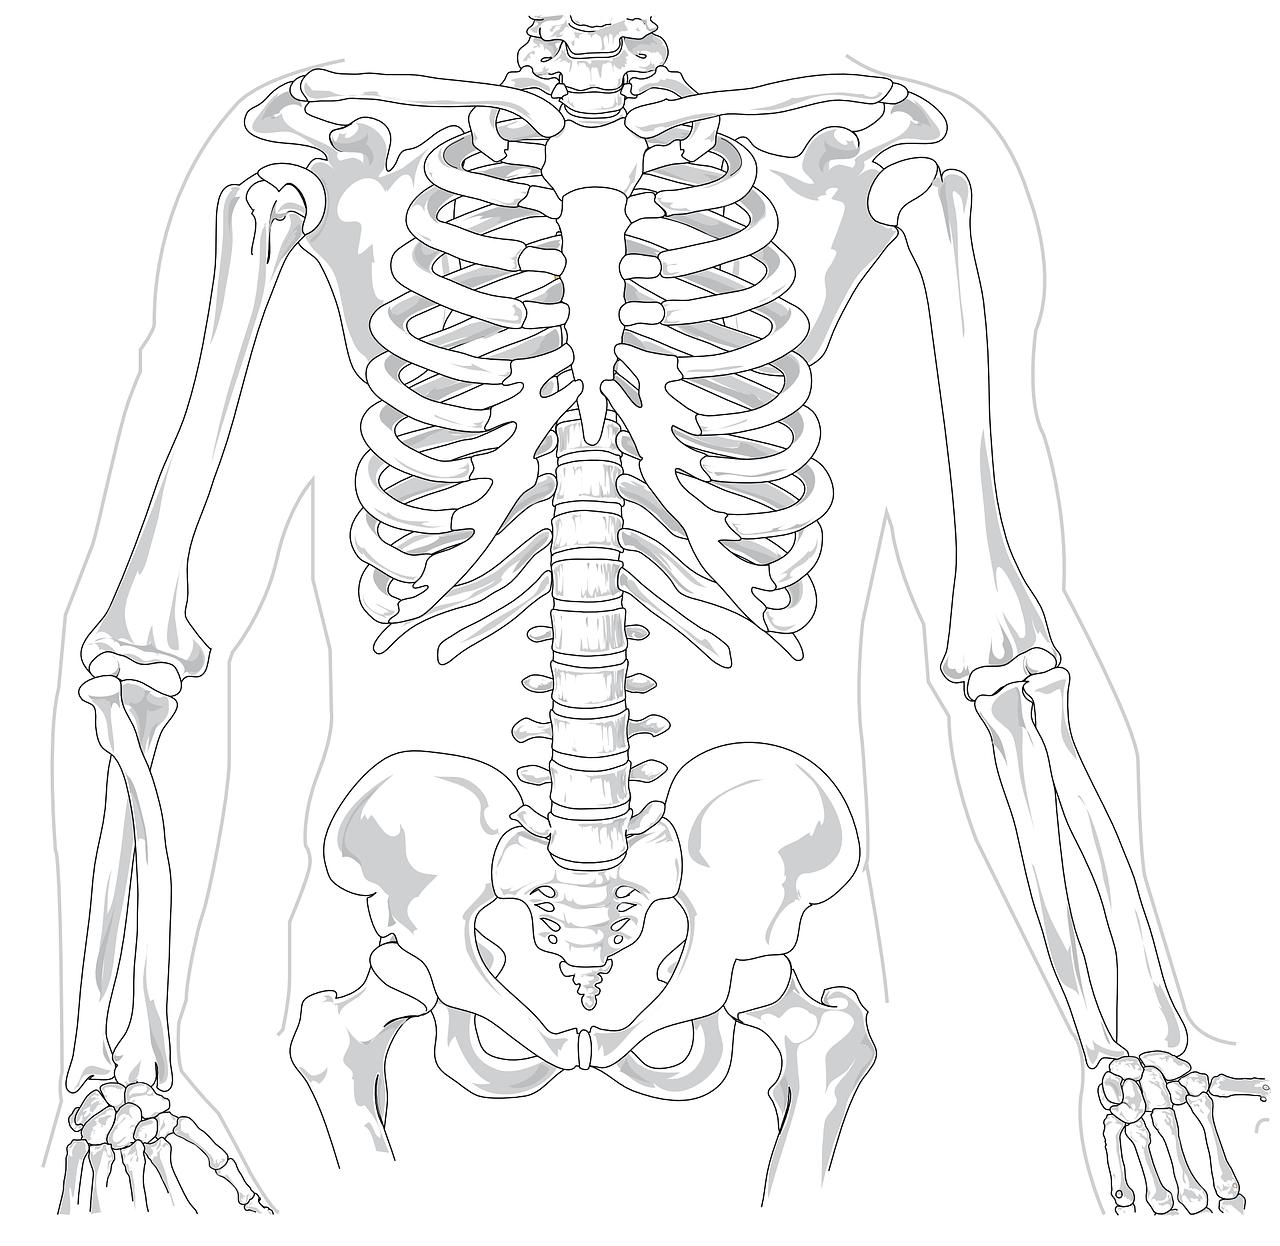 脊柱管狭窄症の保険加入